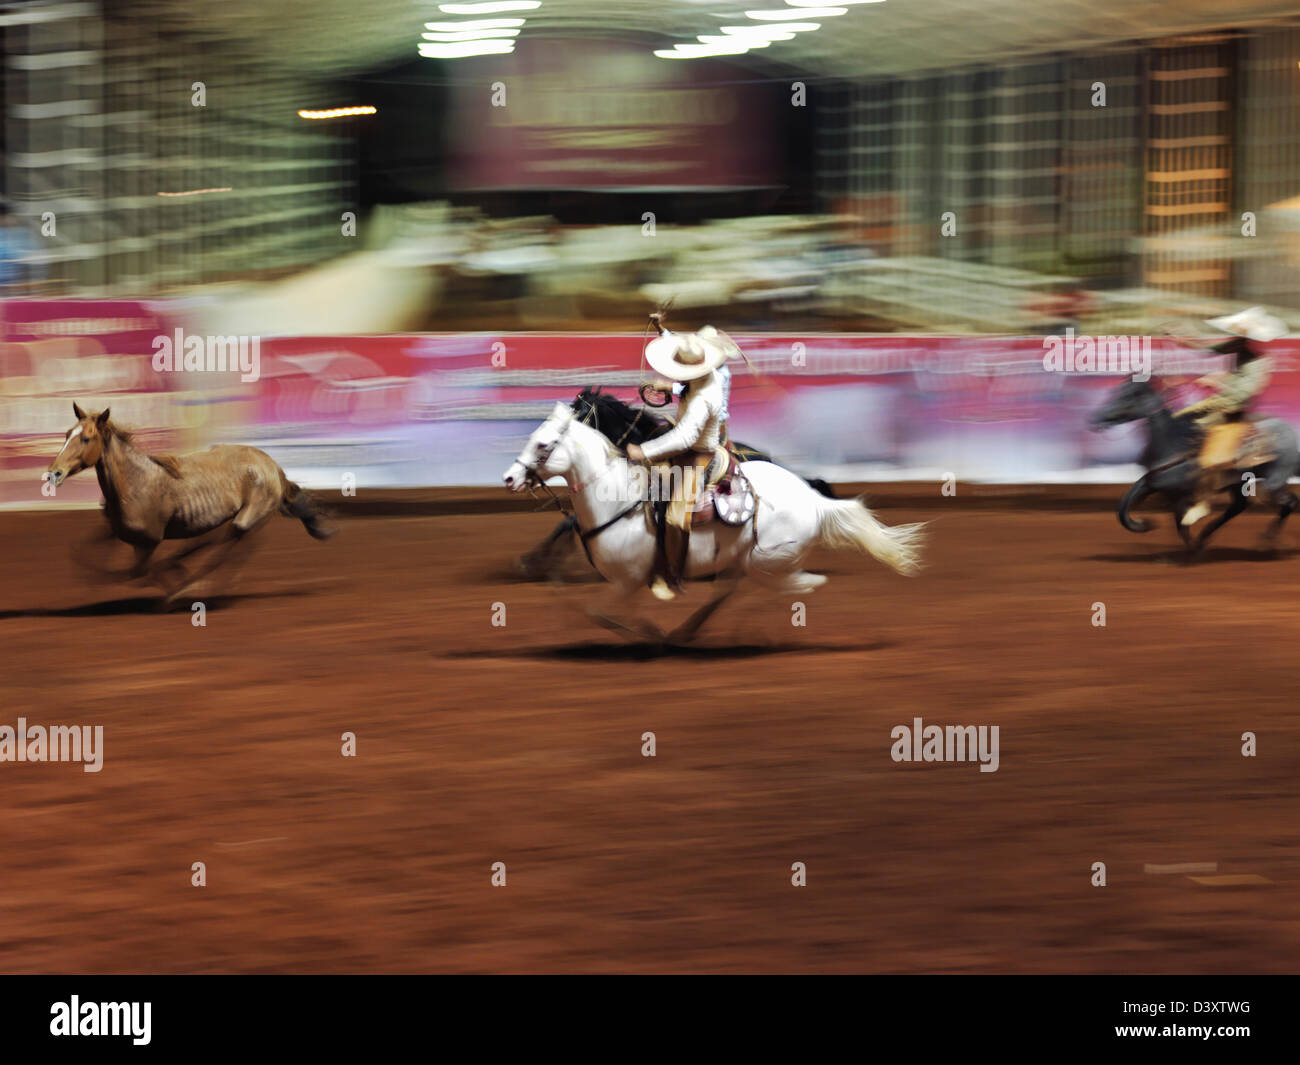 Mexiko, Jalisco, Guadalajara, mexikanische Charro Teilnahme an Charreadas, eine Art von rodeo Stockbild